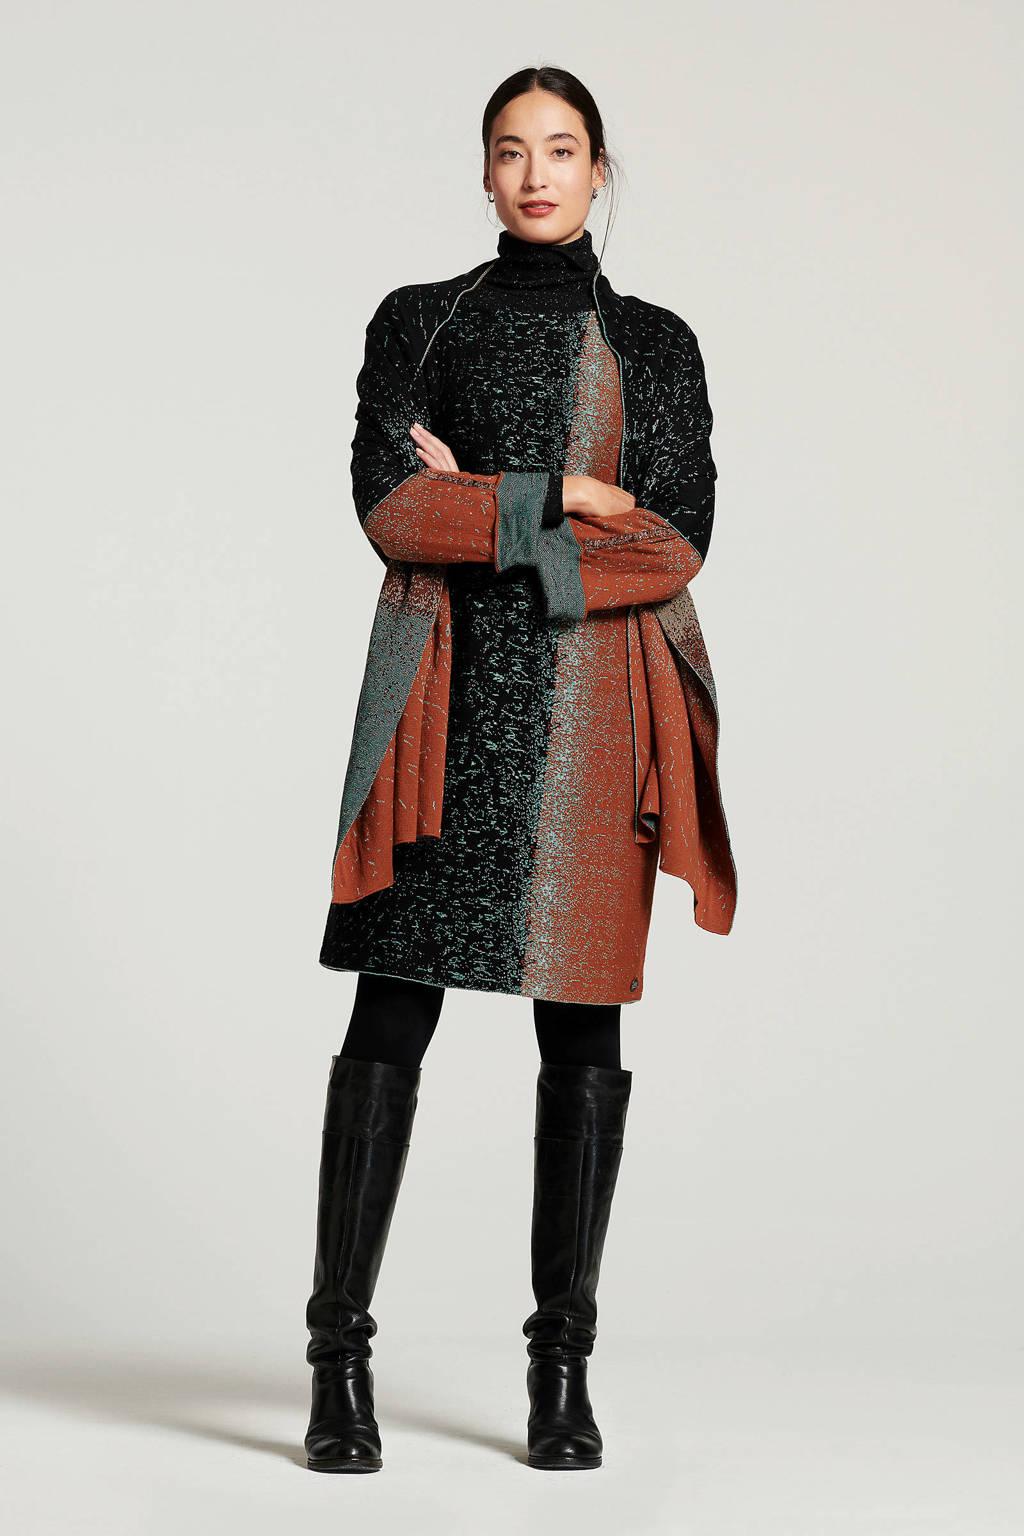 Didi jersey jurk met glitters bruin/donkerblauw, Bruin/donkerblauw